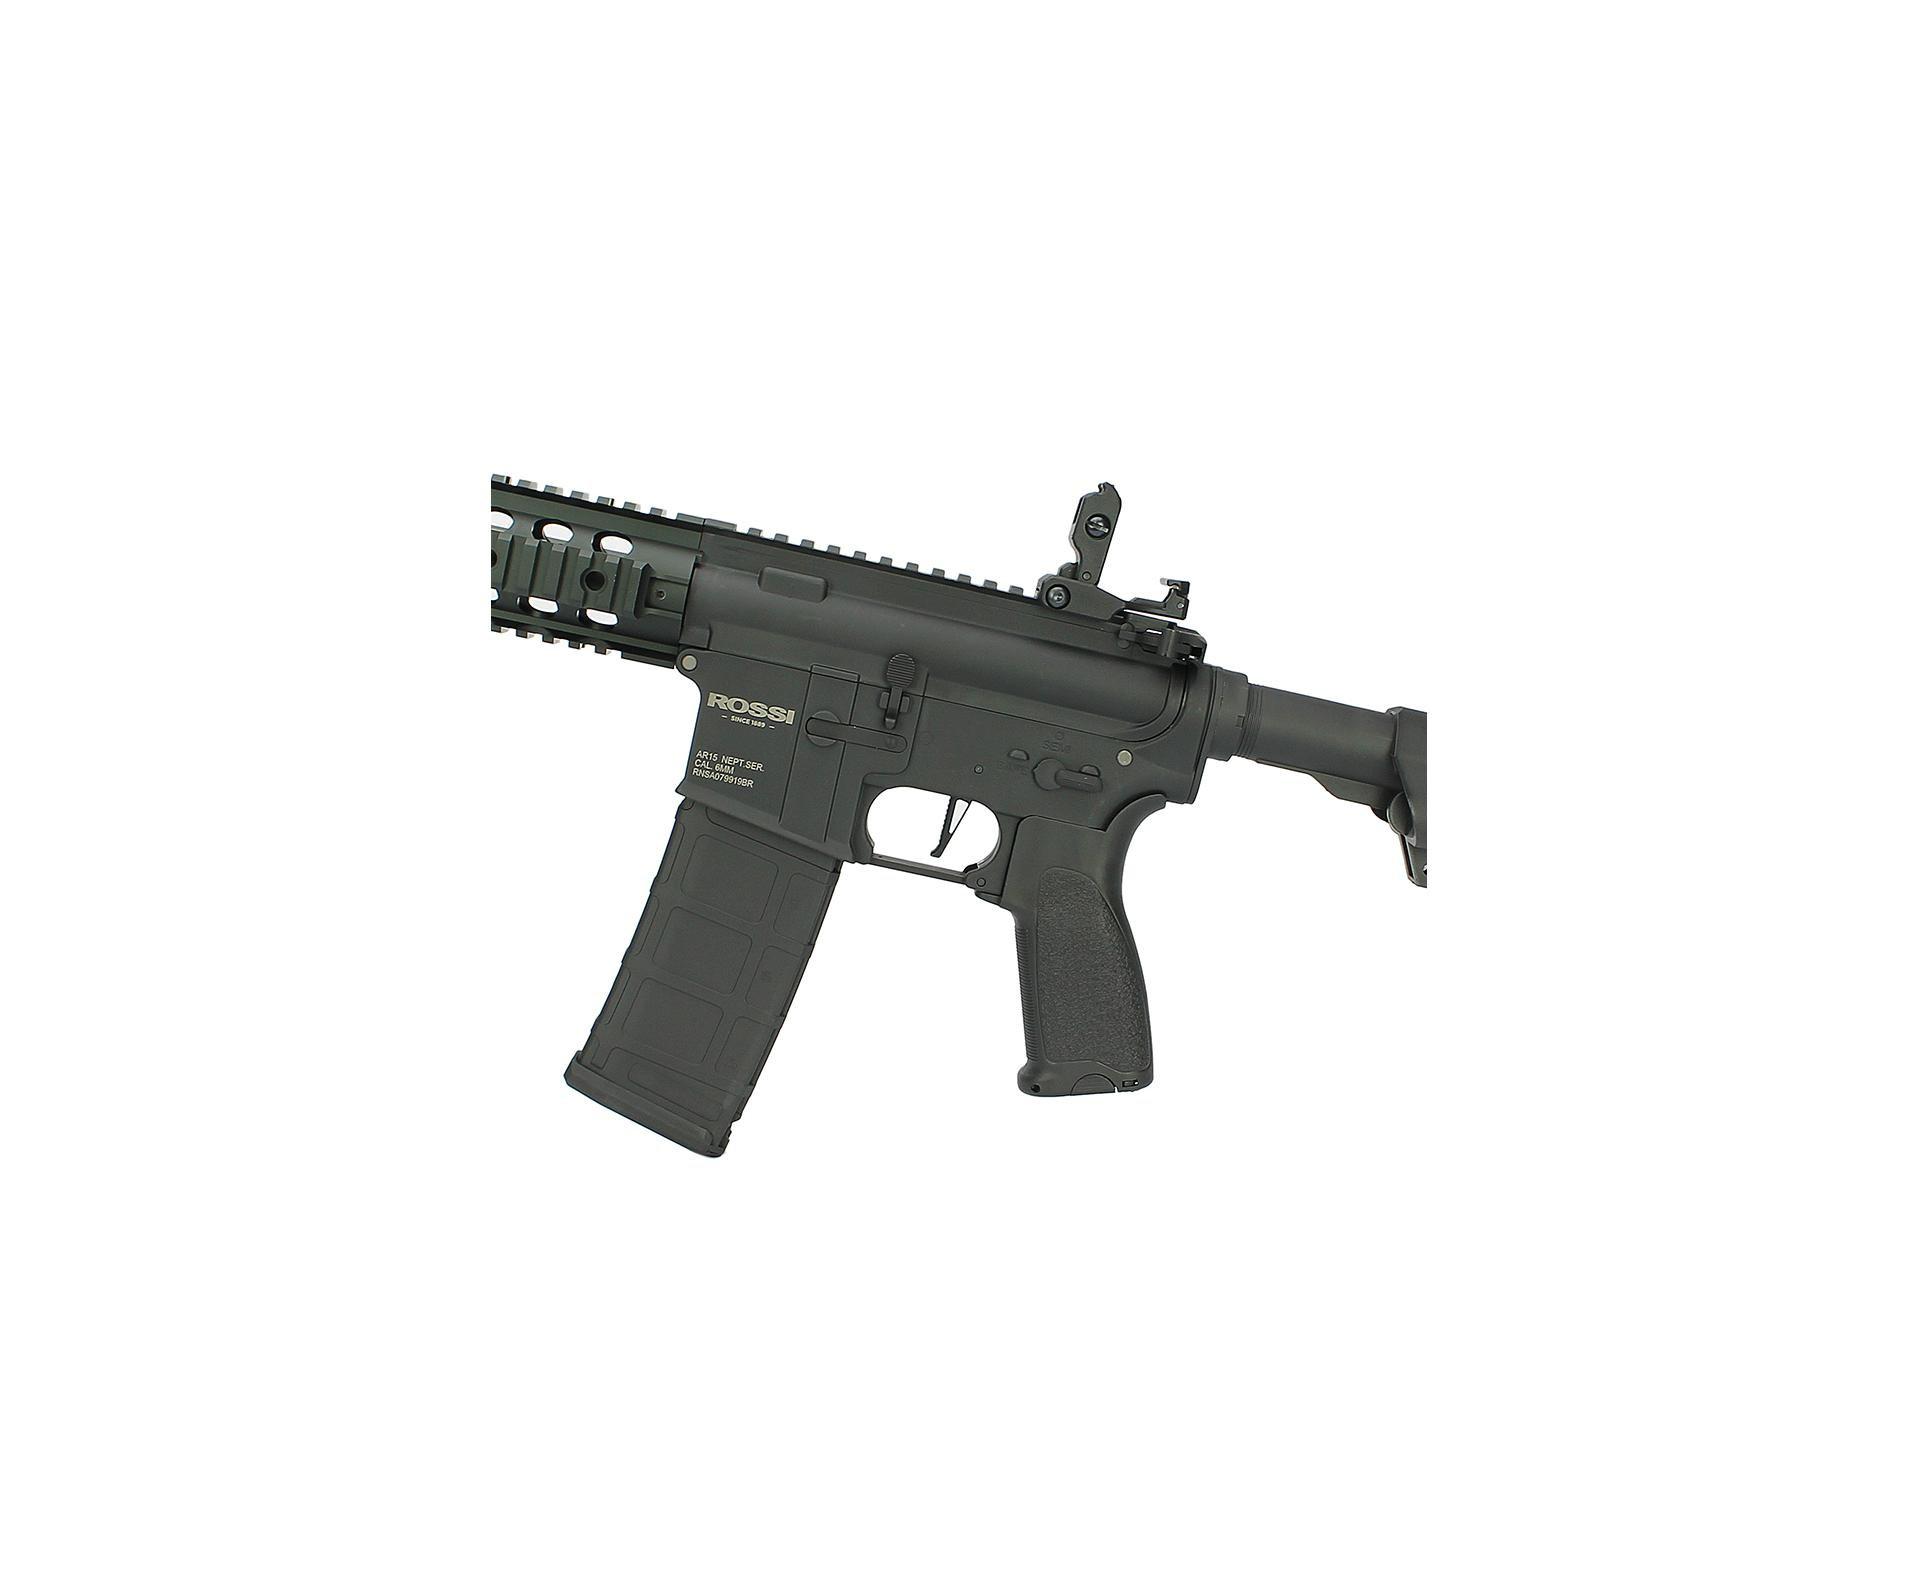 "Rifle De Airsoft Ar15 Neptune Full Metal Keymod 8"" Sd Et Elet 6mm Rossi"